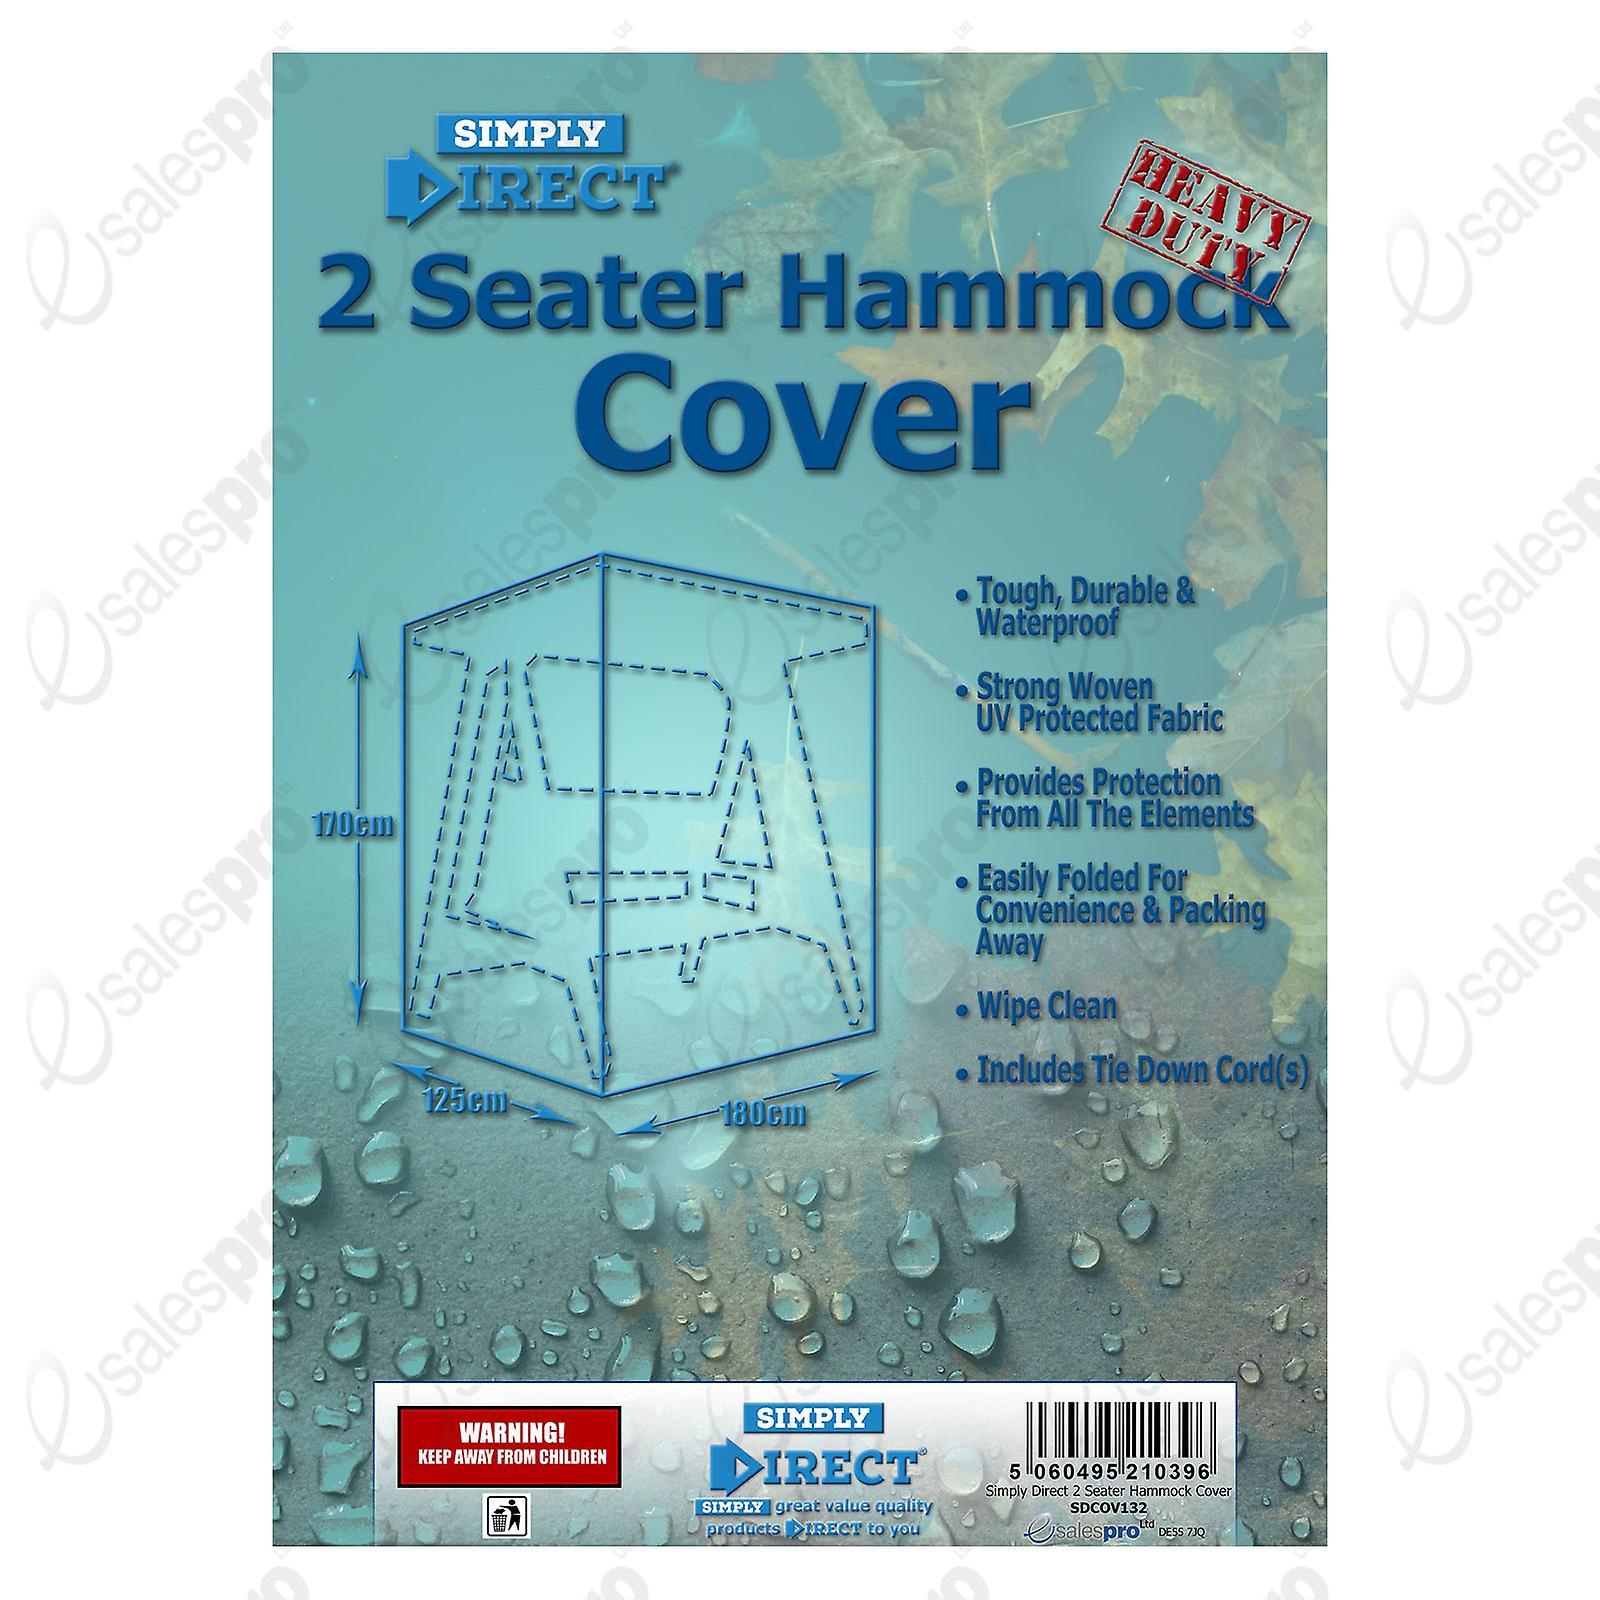 Simply Direct 2 Seater Hammock Cover - Waterproof Weatherproof Furniture Protector